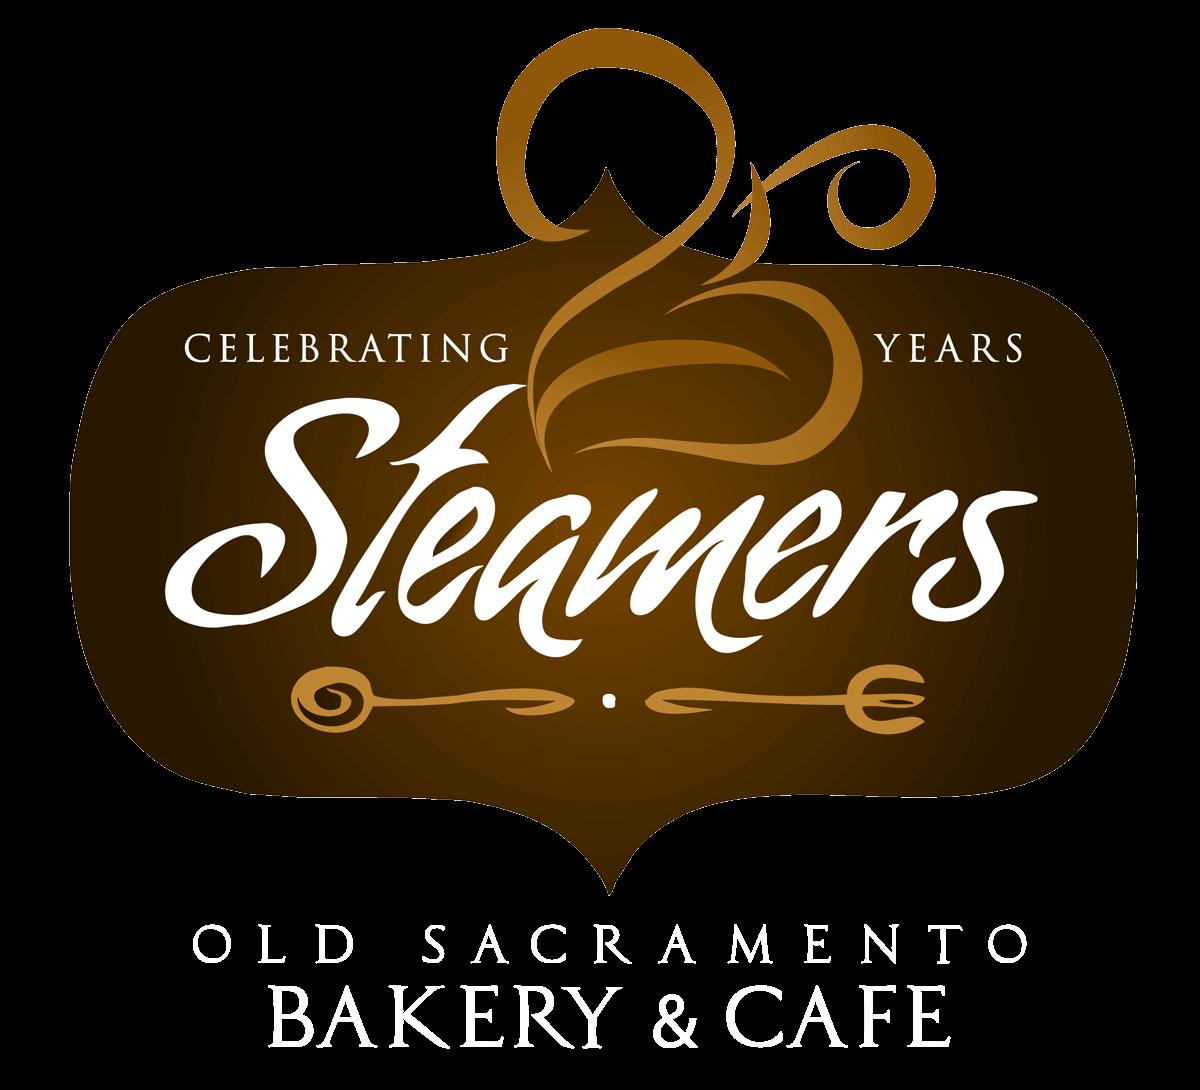 Steamers25-w-bakerycafe-z